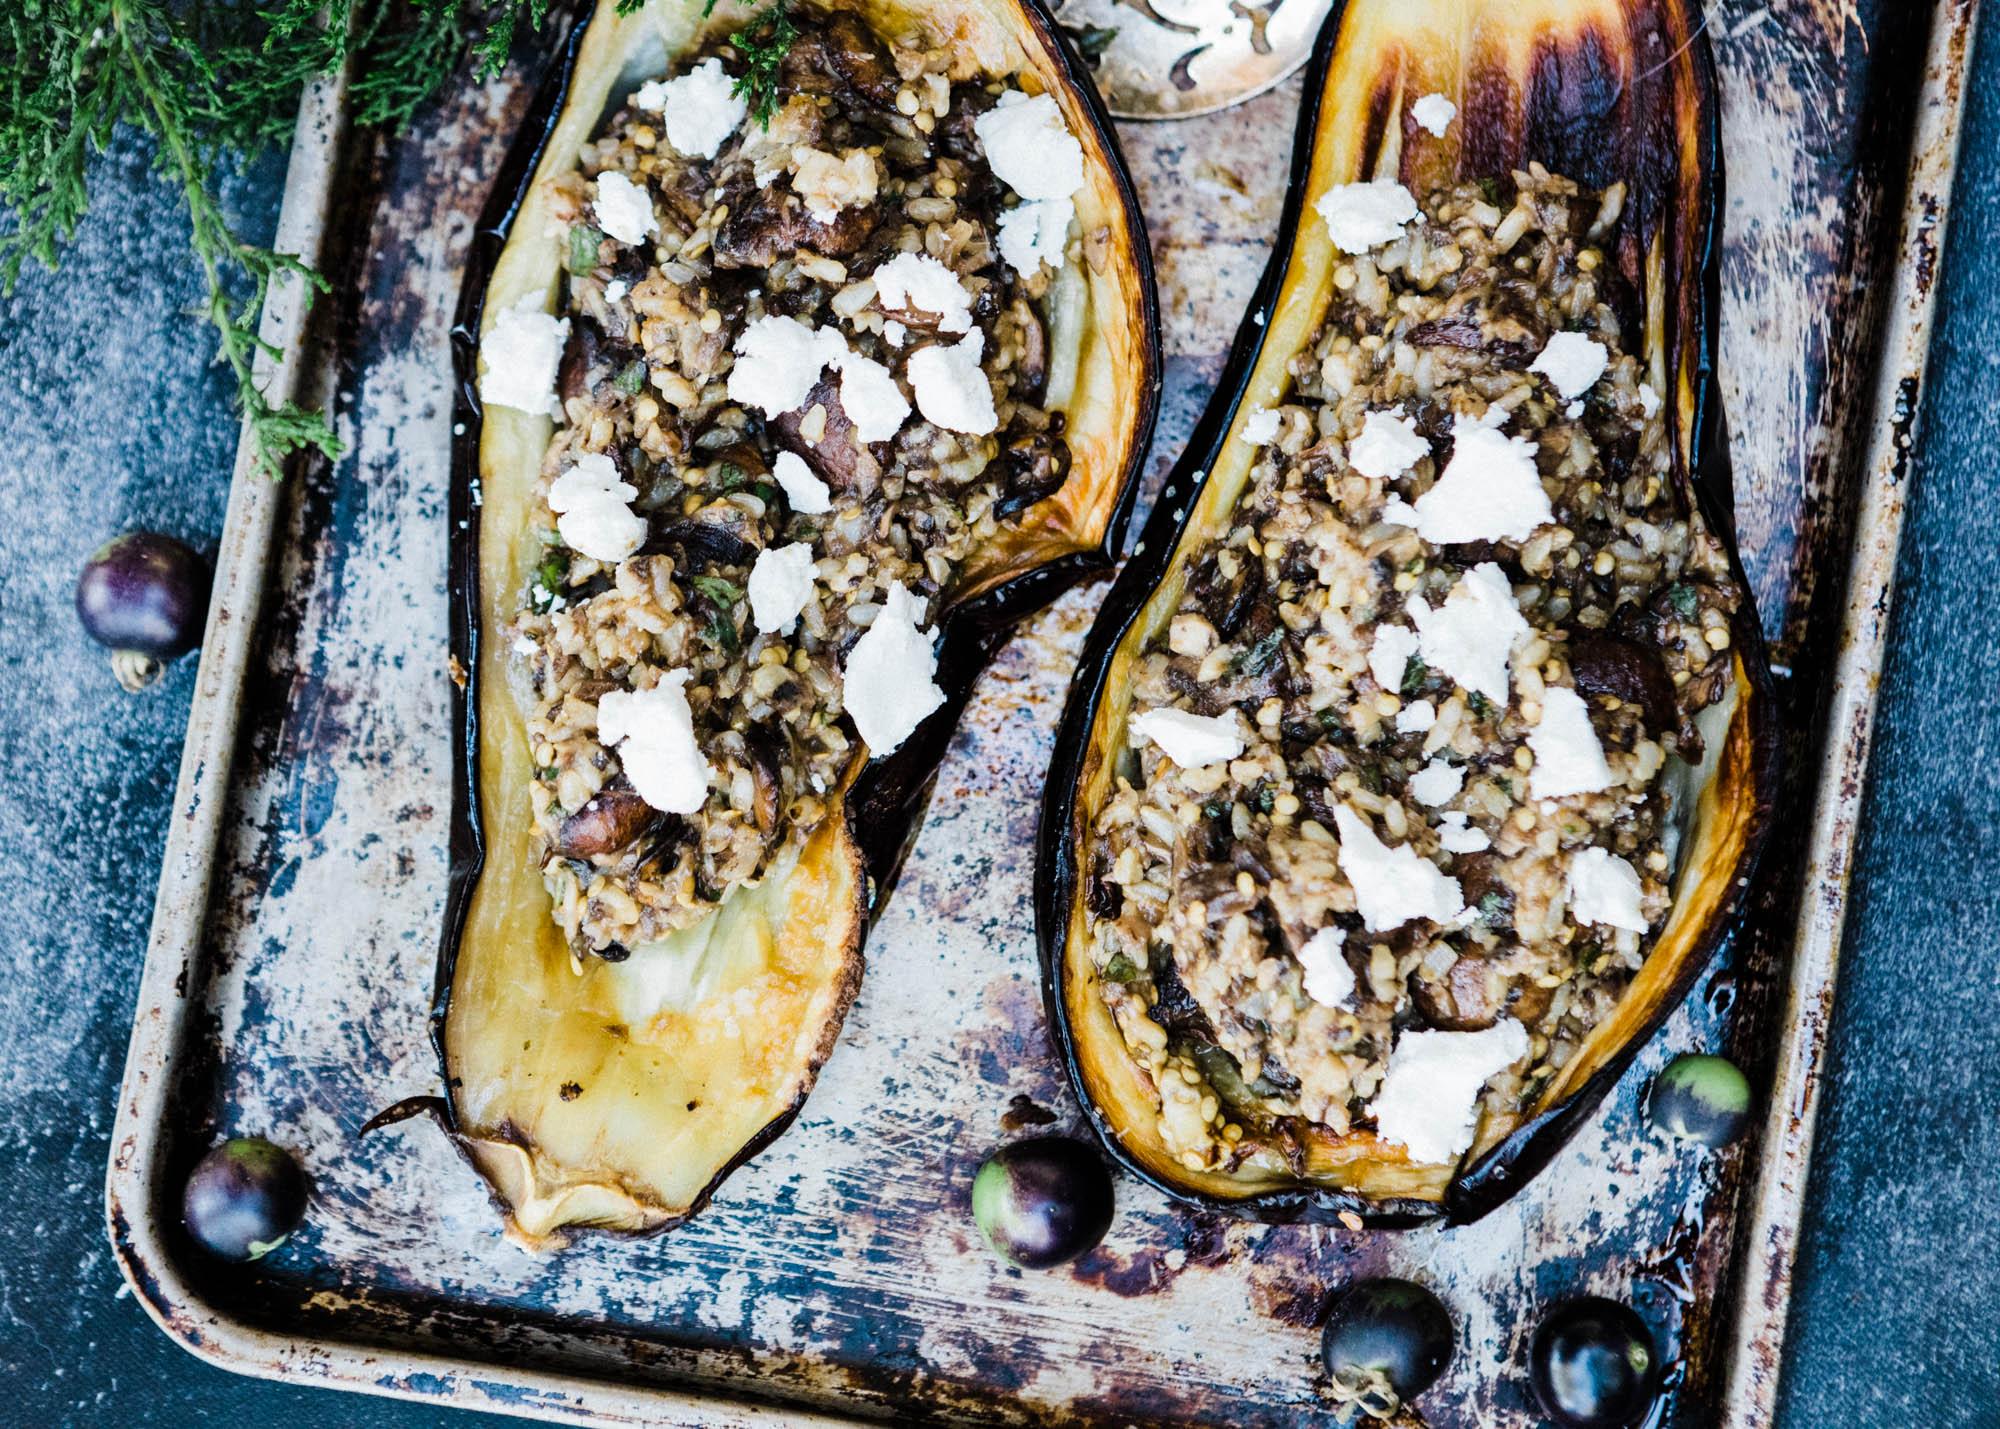 Stuffed Eggplant | Let's Taco Bout It Blog